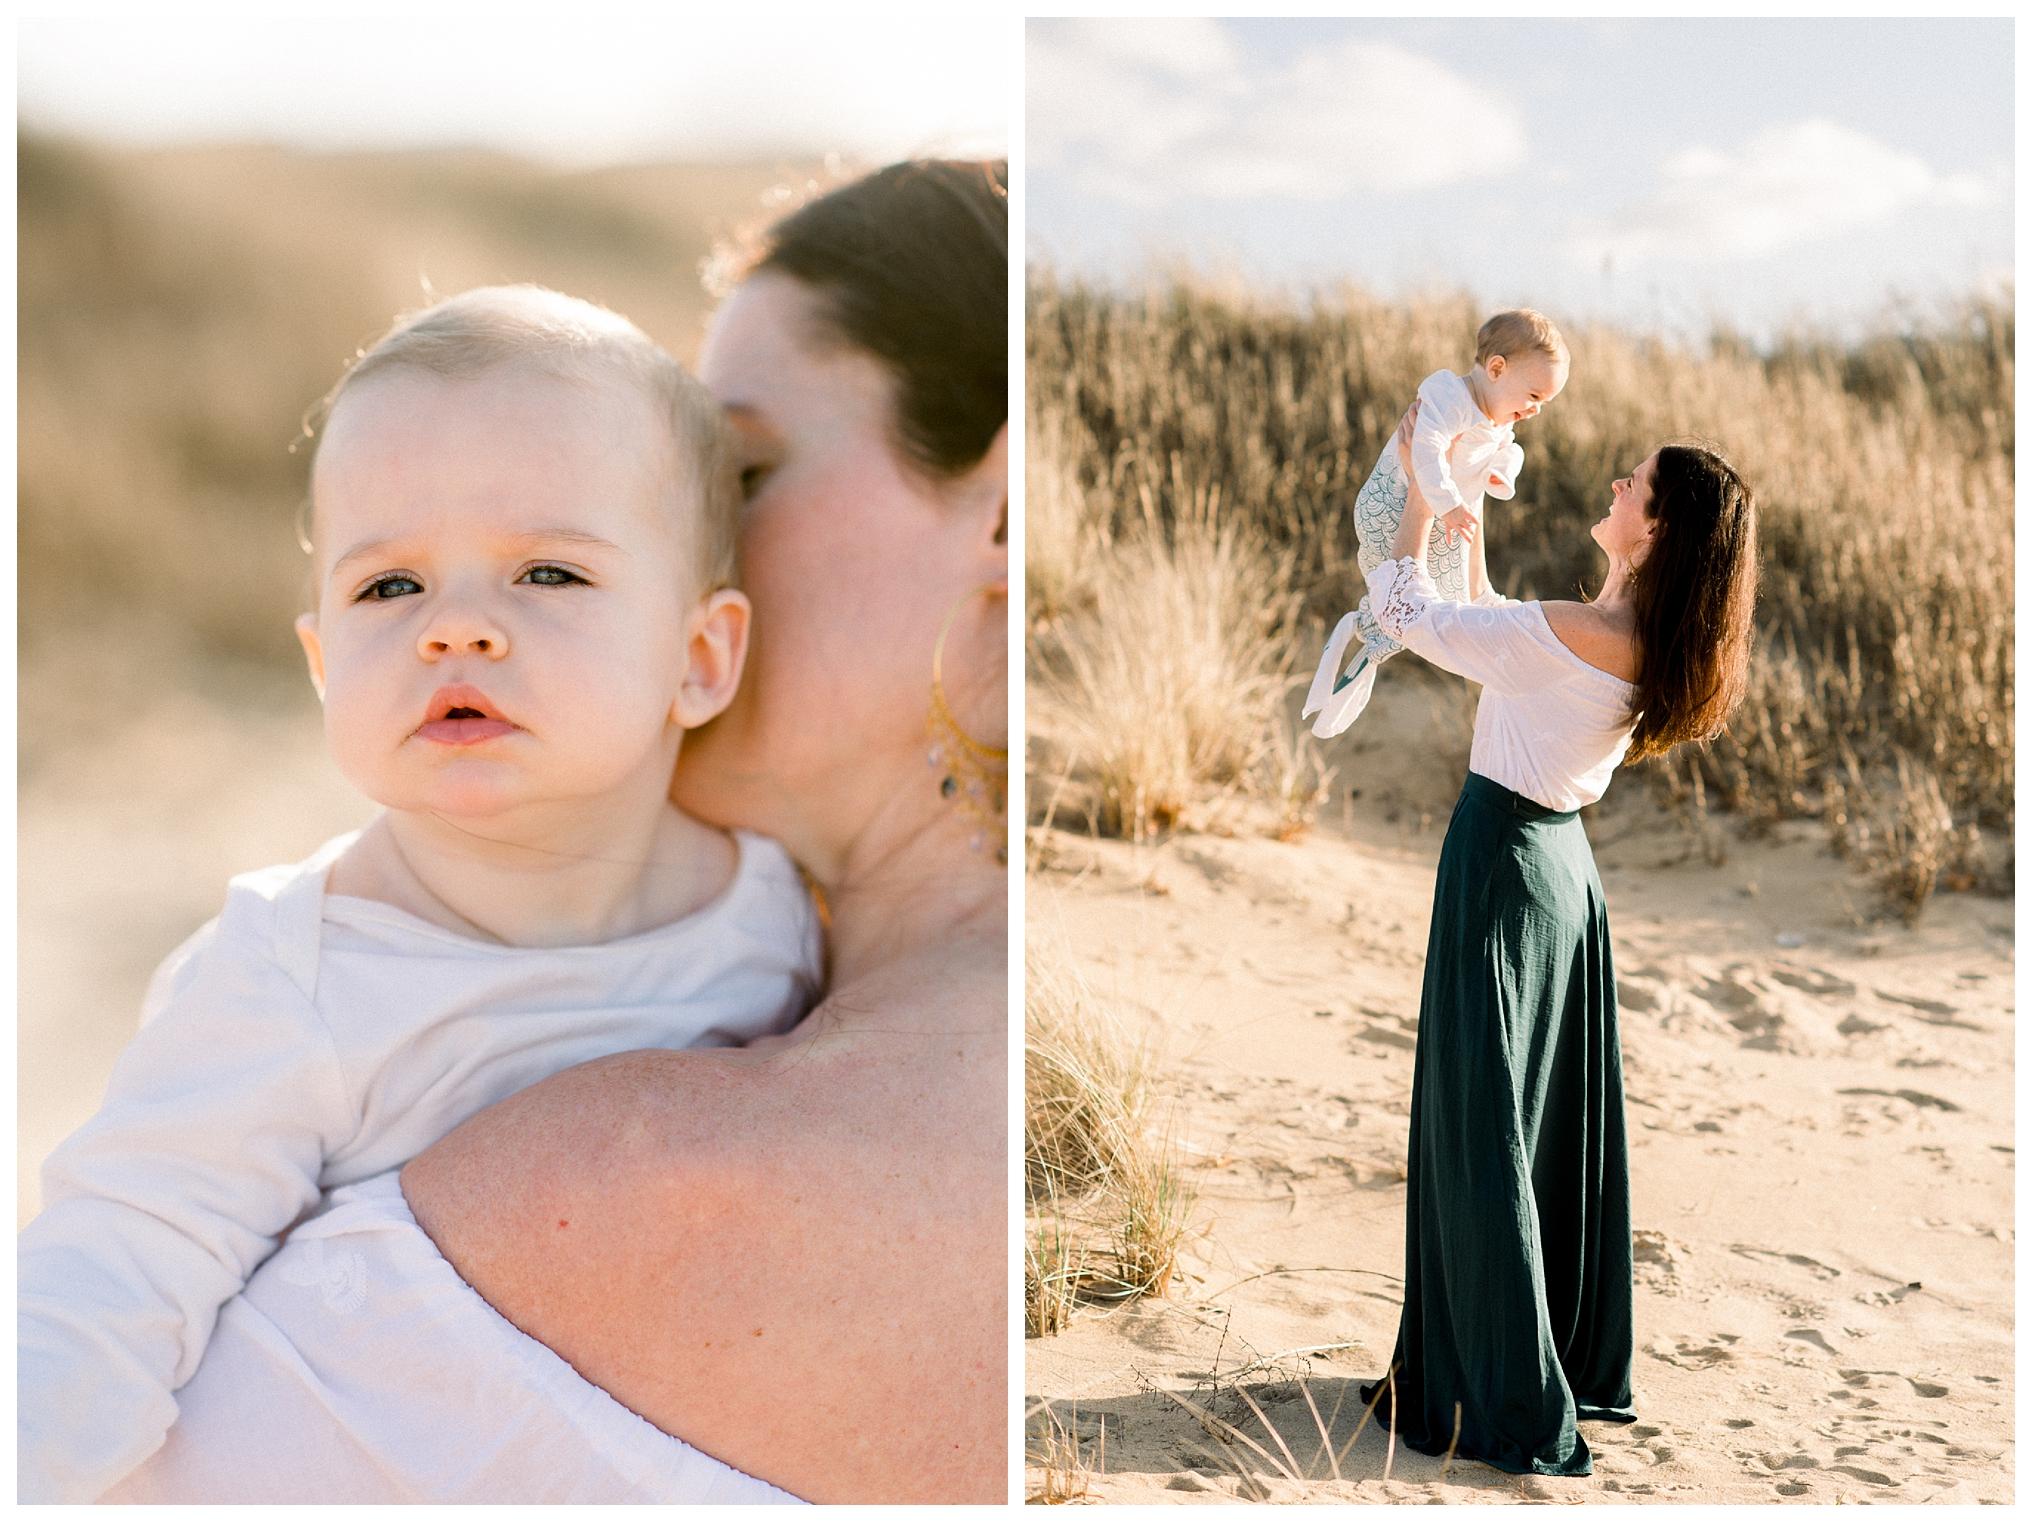 Maine-family-photographer-sweet-light-portraits248.jpg